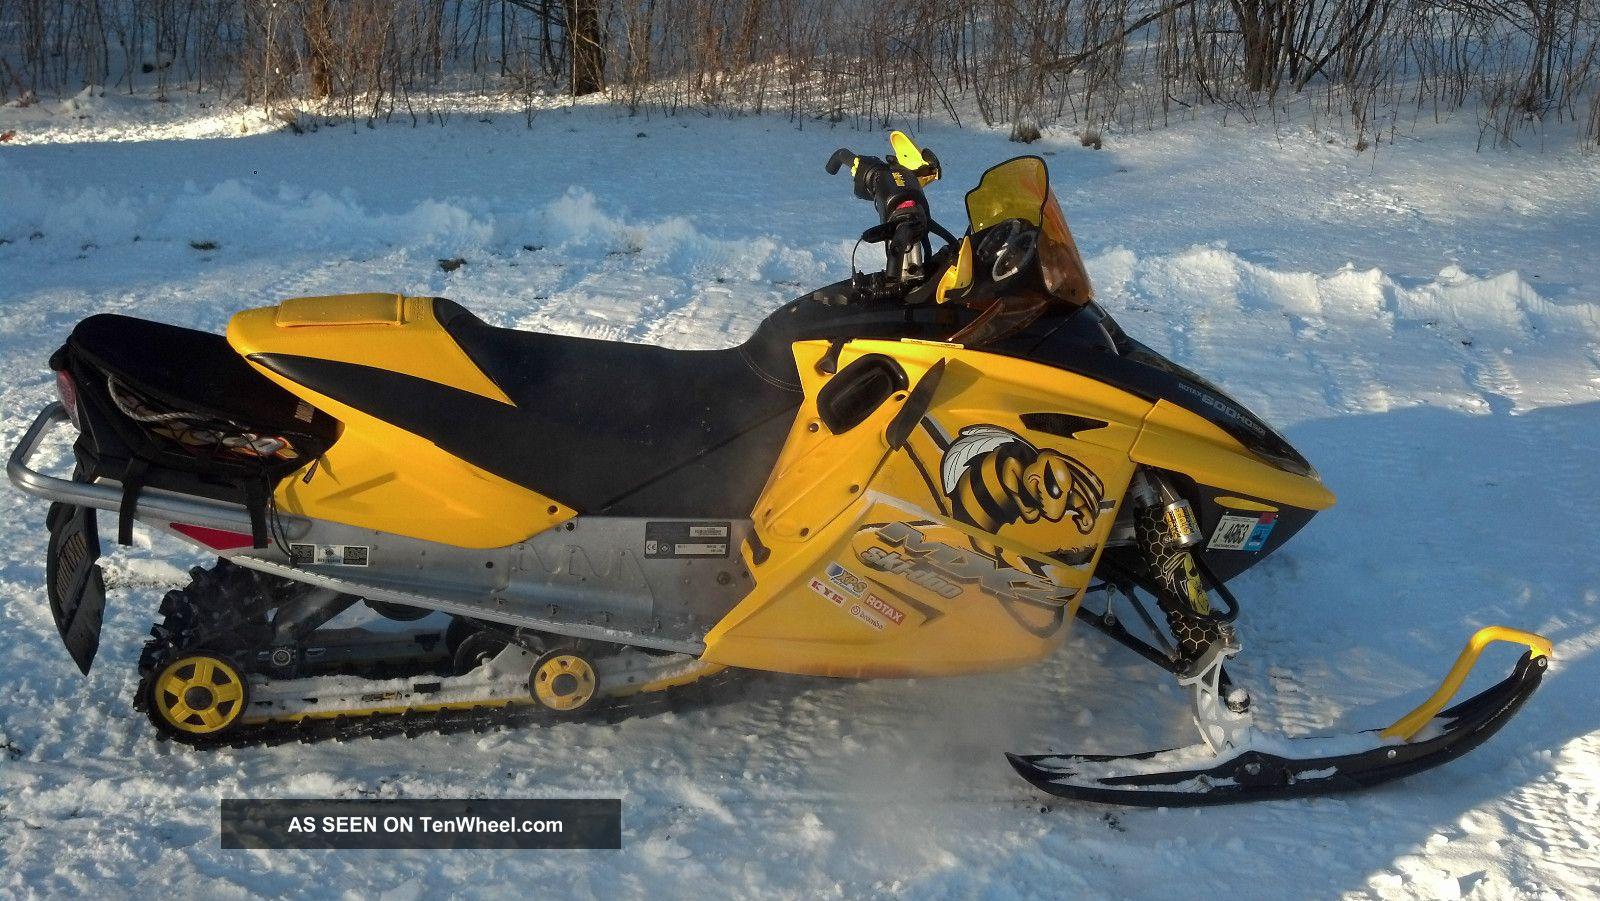 doo mxz ski 600 2006 sdi snowmobiles powersports skidoo